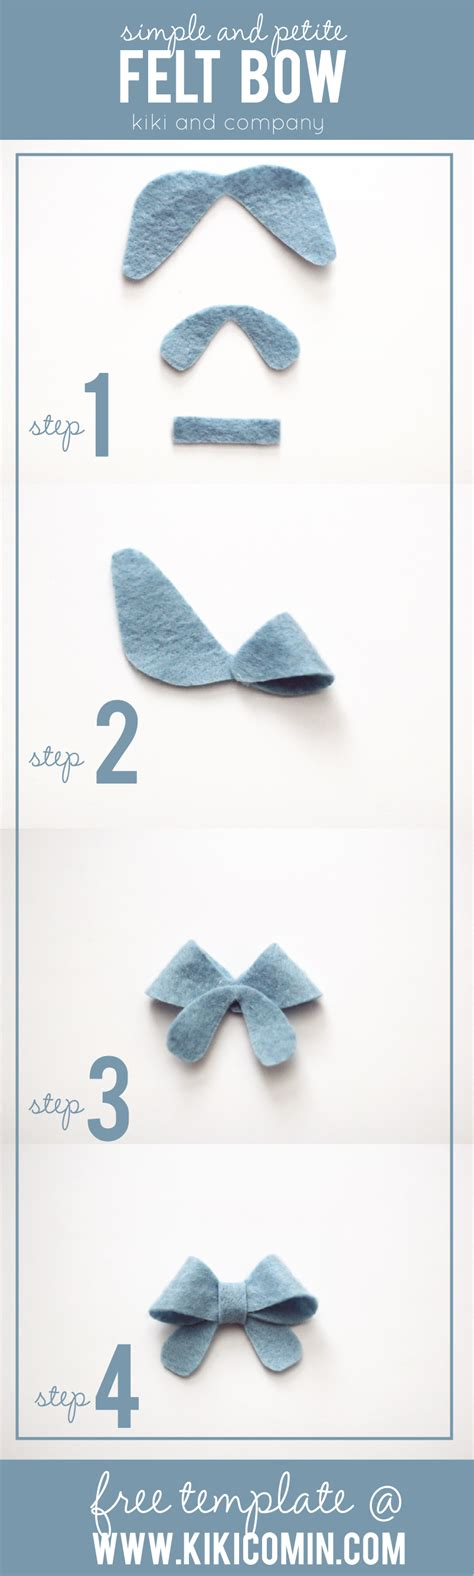 felt bow template simple and felt bow free template company